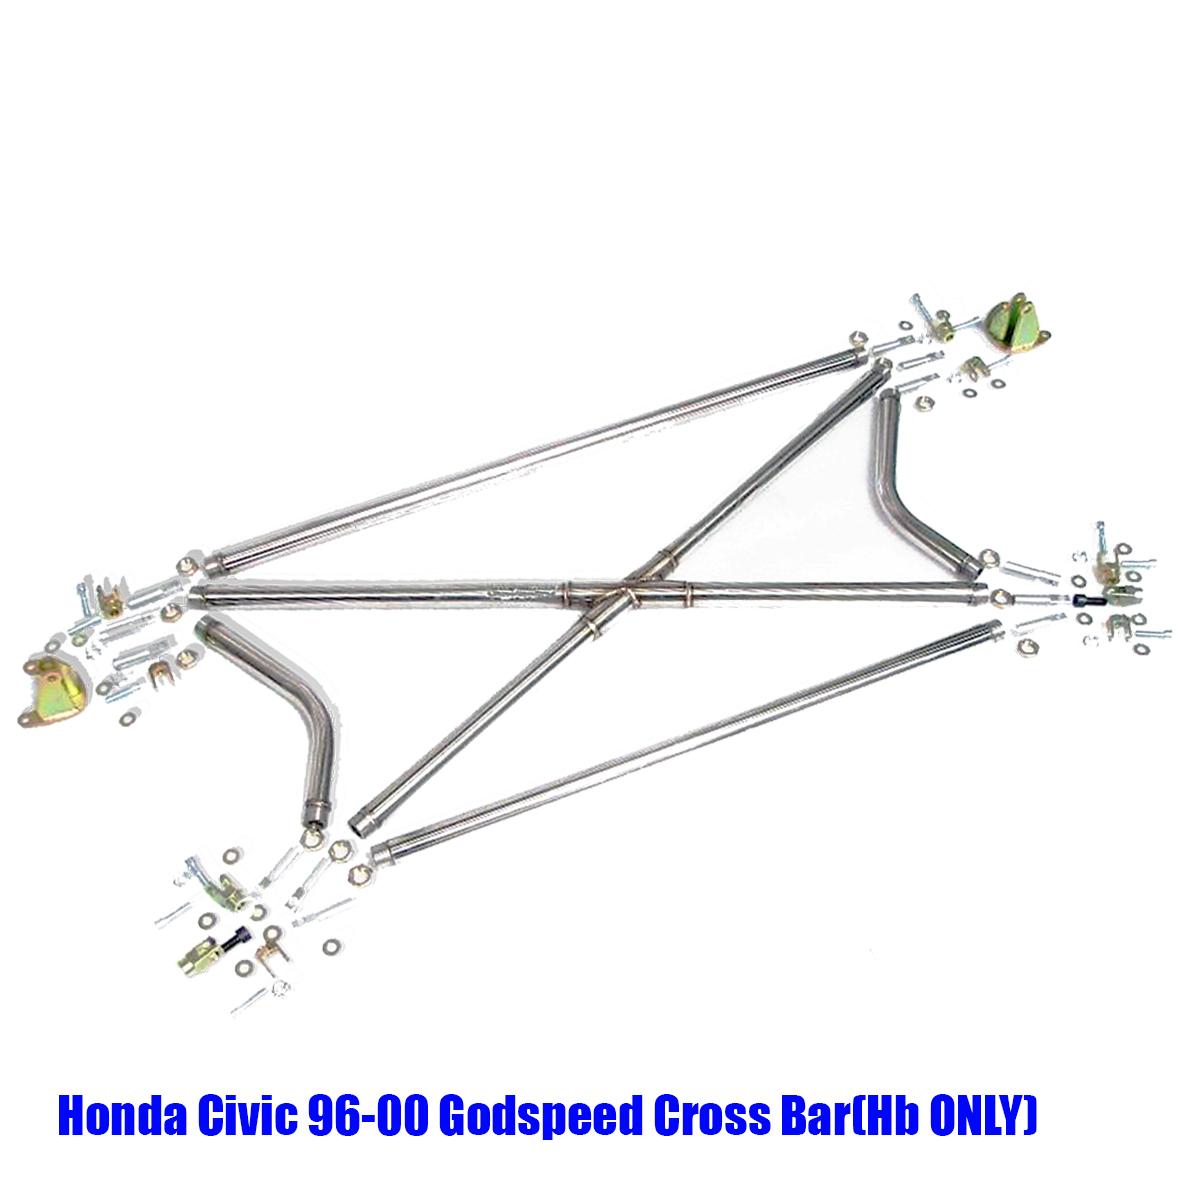 Honda Civic 96 97 98 99 00 Godspeed Cross BAR (Hatchback